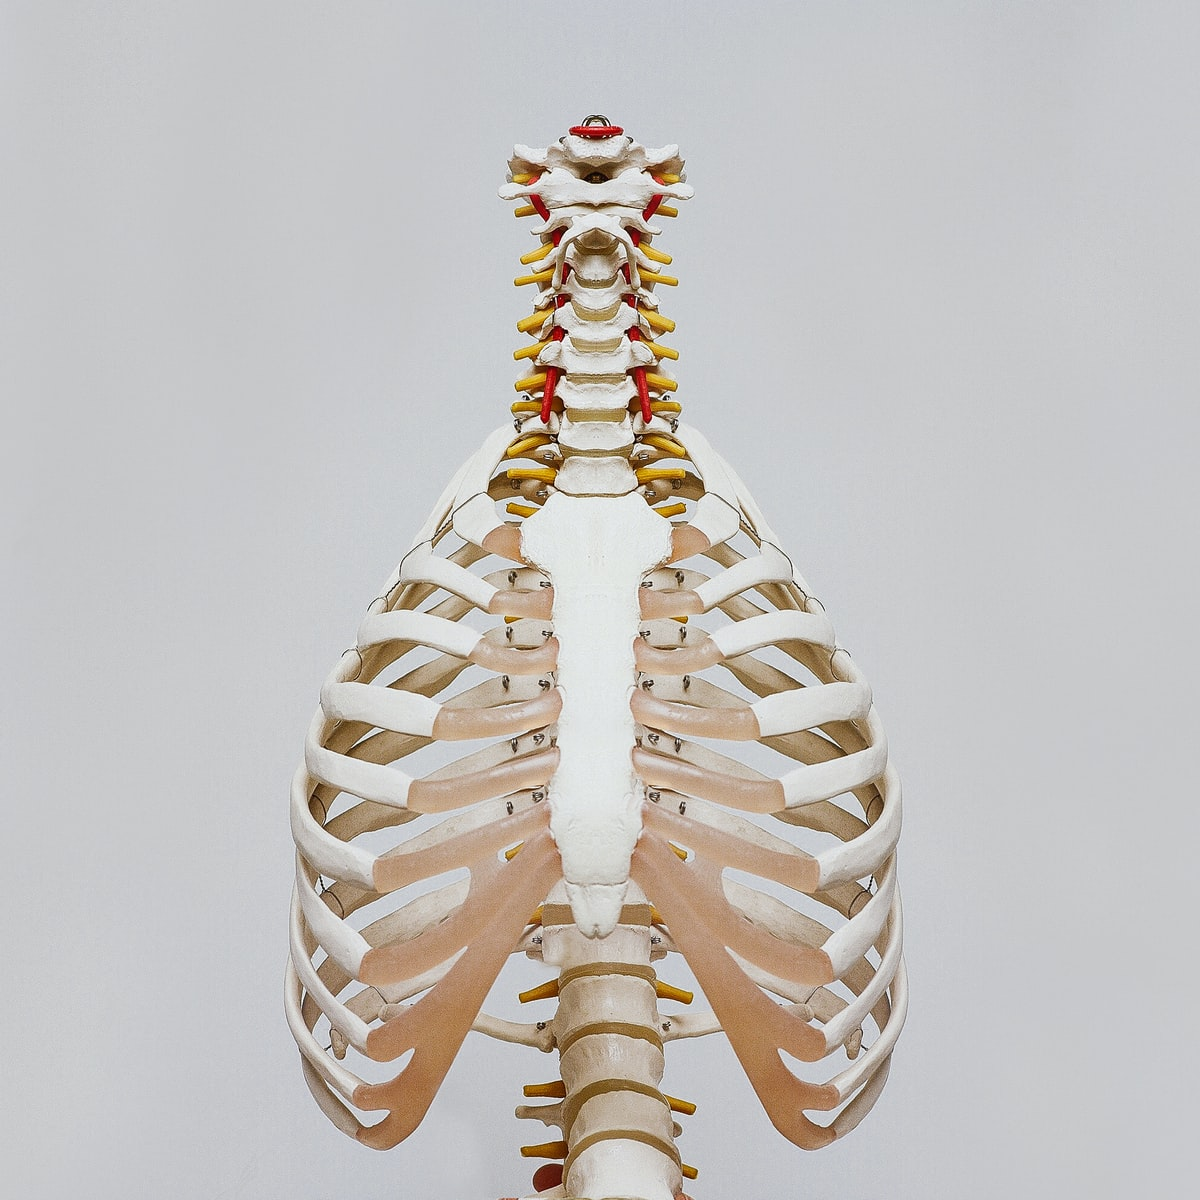 148 Skeleton Jokes - Worst Jokes Ever